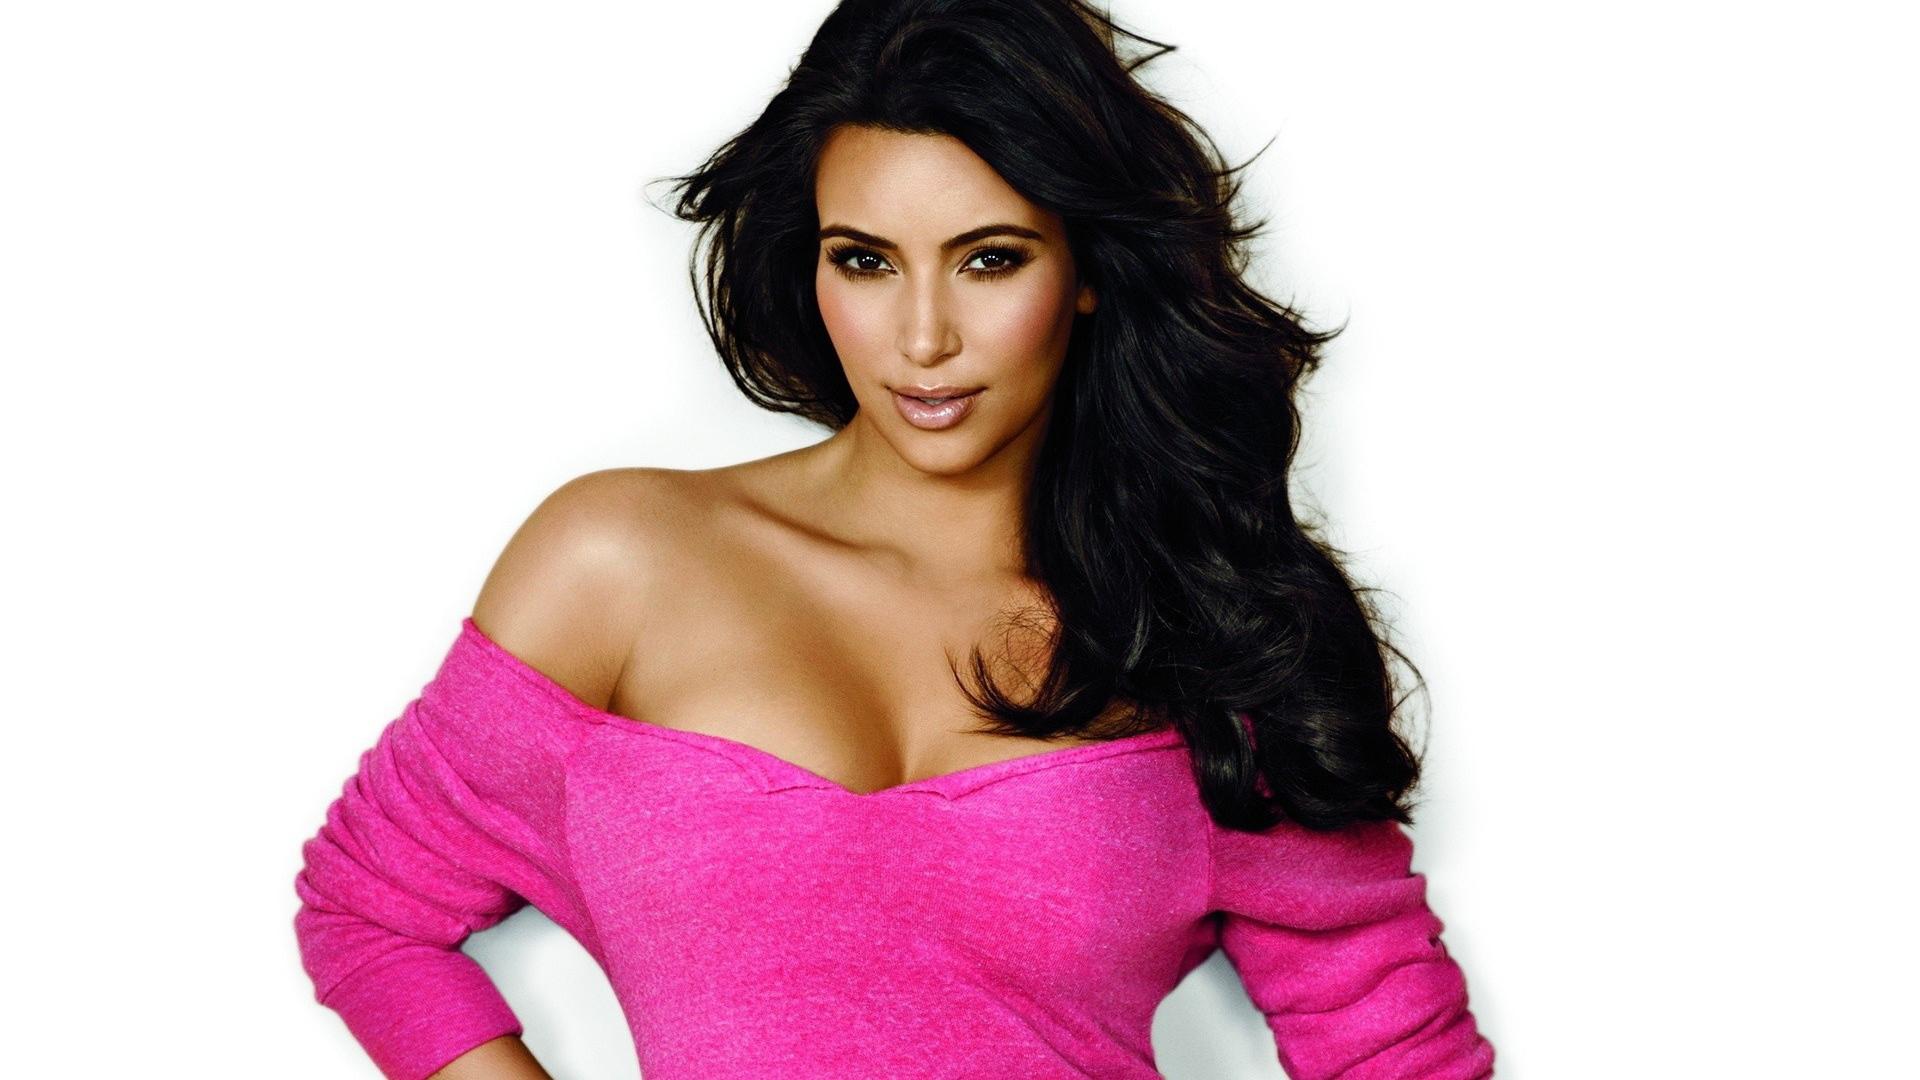 Kim Kardashian Wallpaper For Windows